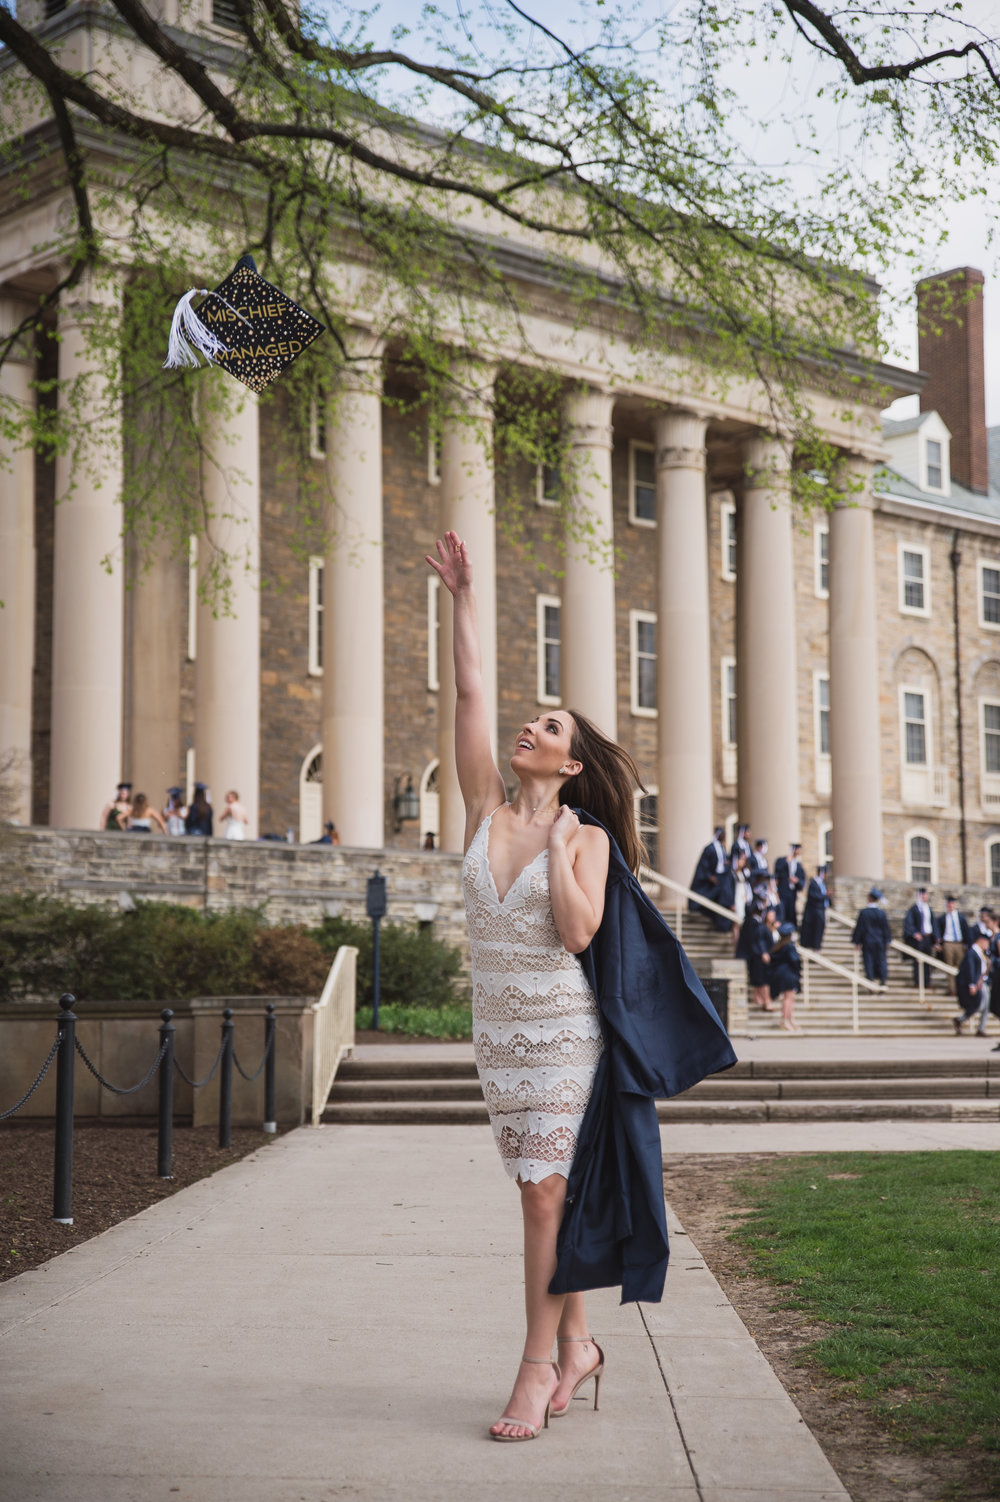 Graduation_Leah_Snyder-183.JPG